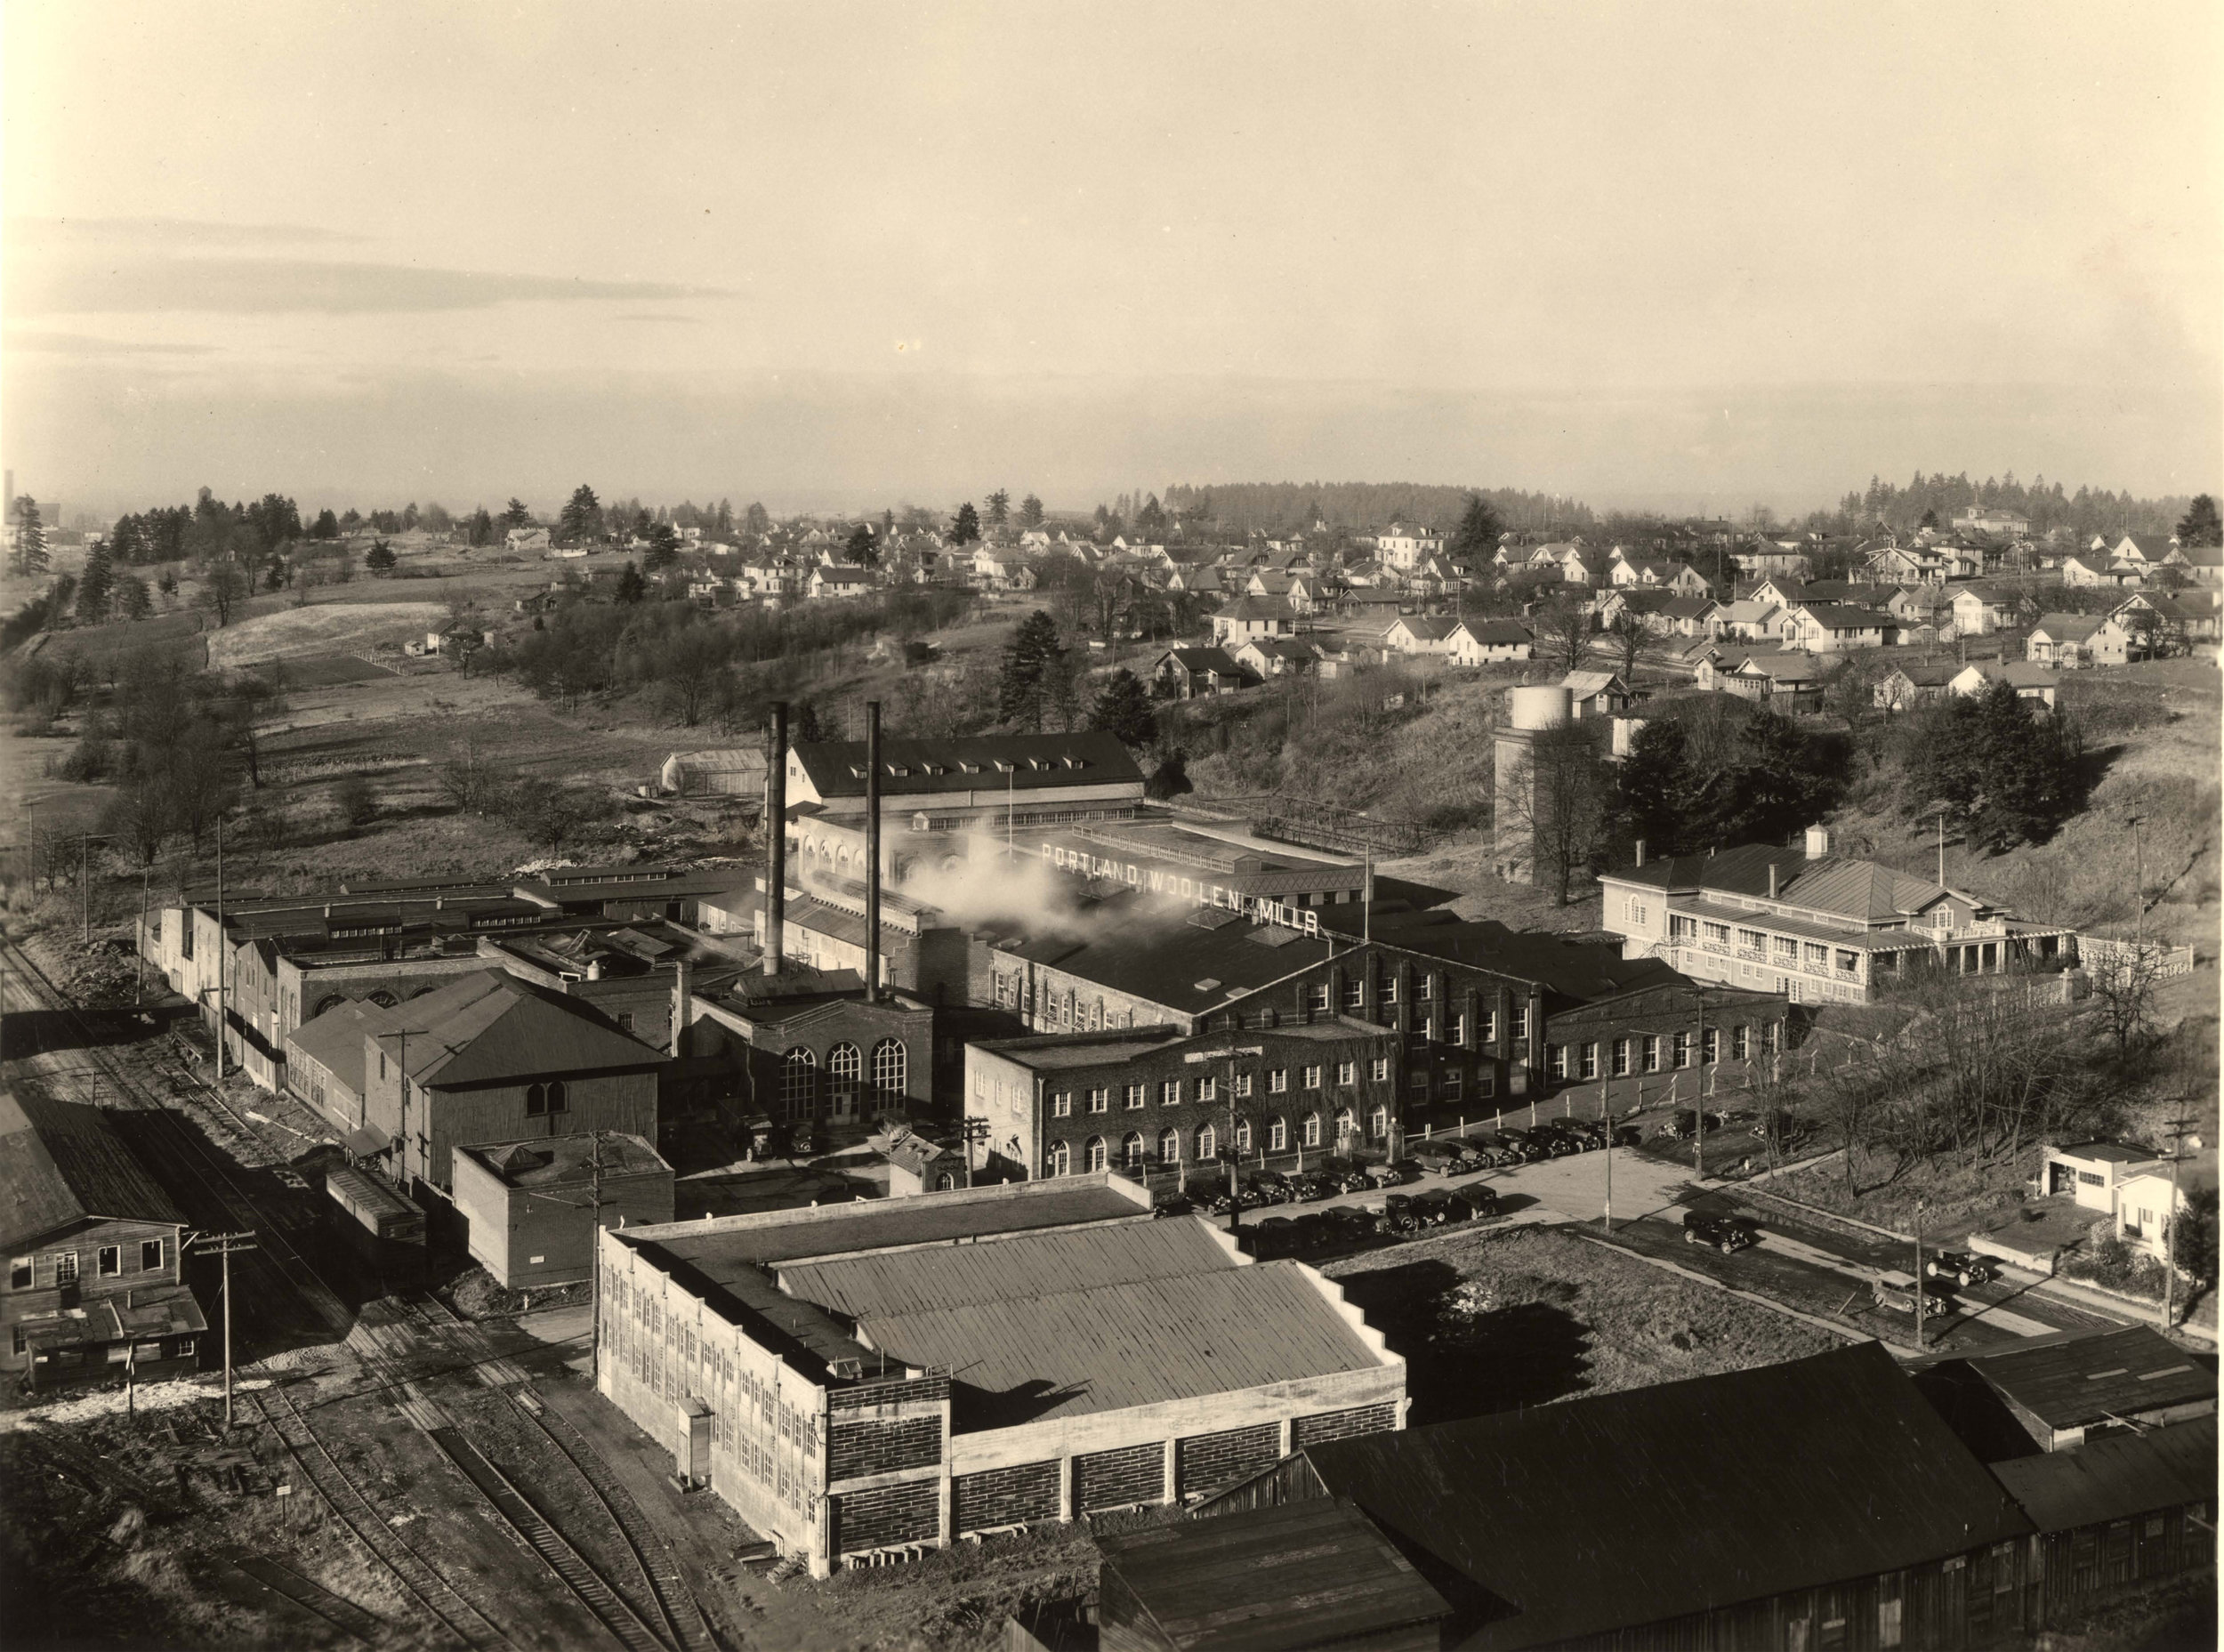 Portland Woolen Mills v2 1935.jpg